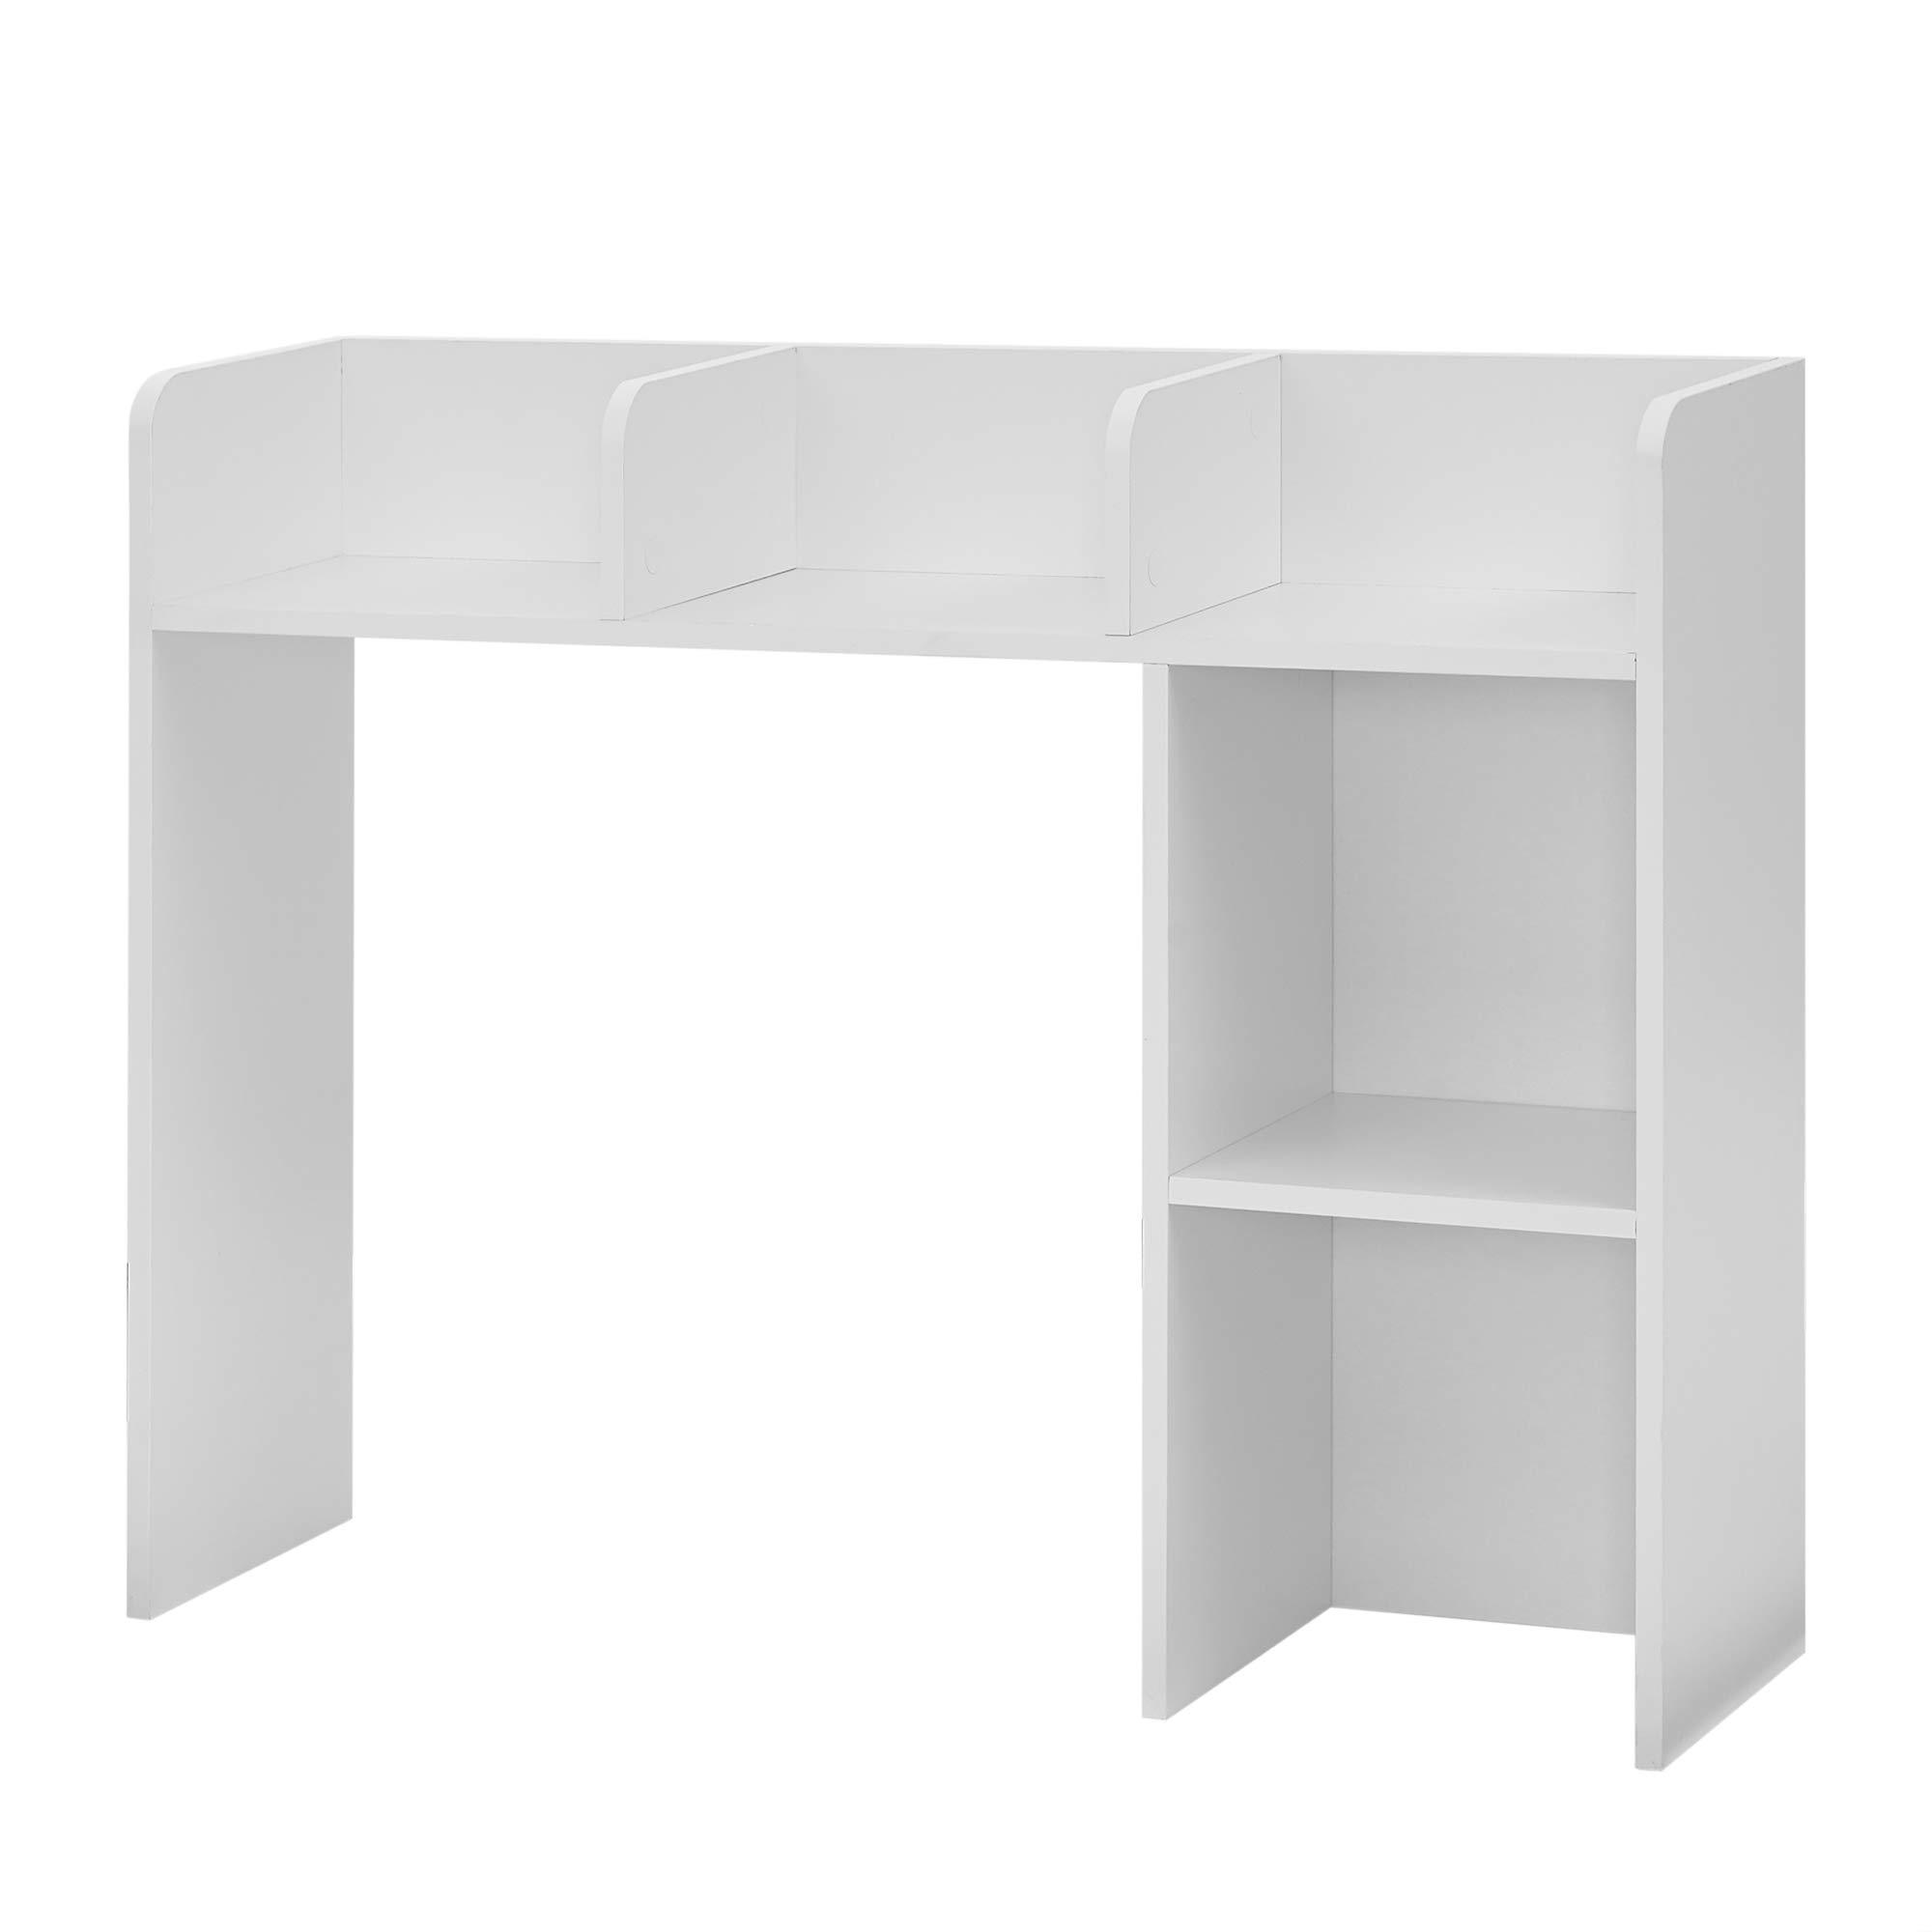 DormCo Classic Desk Bookshelf - White by DormCo (Image #1)